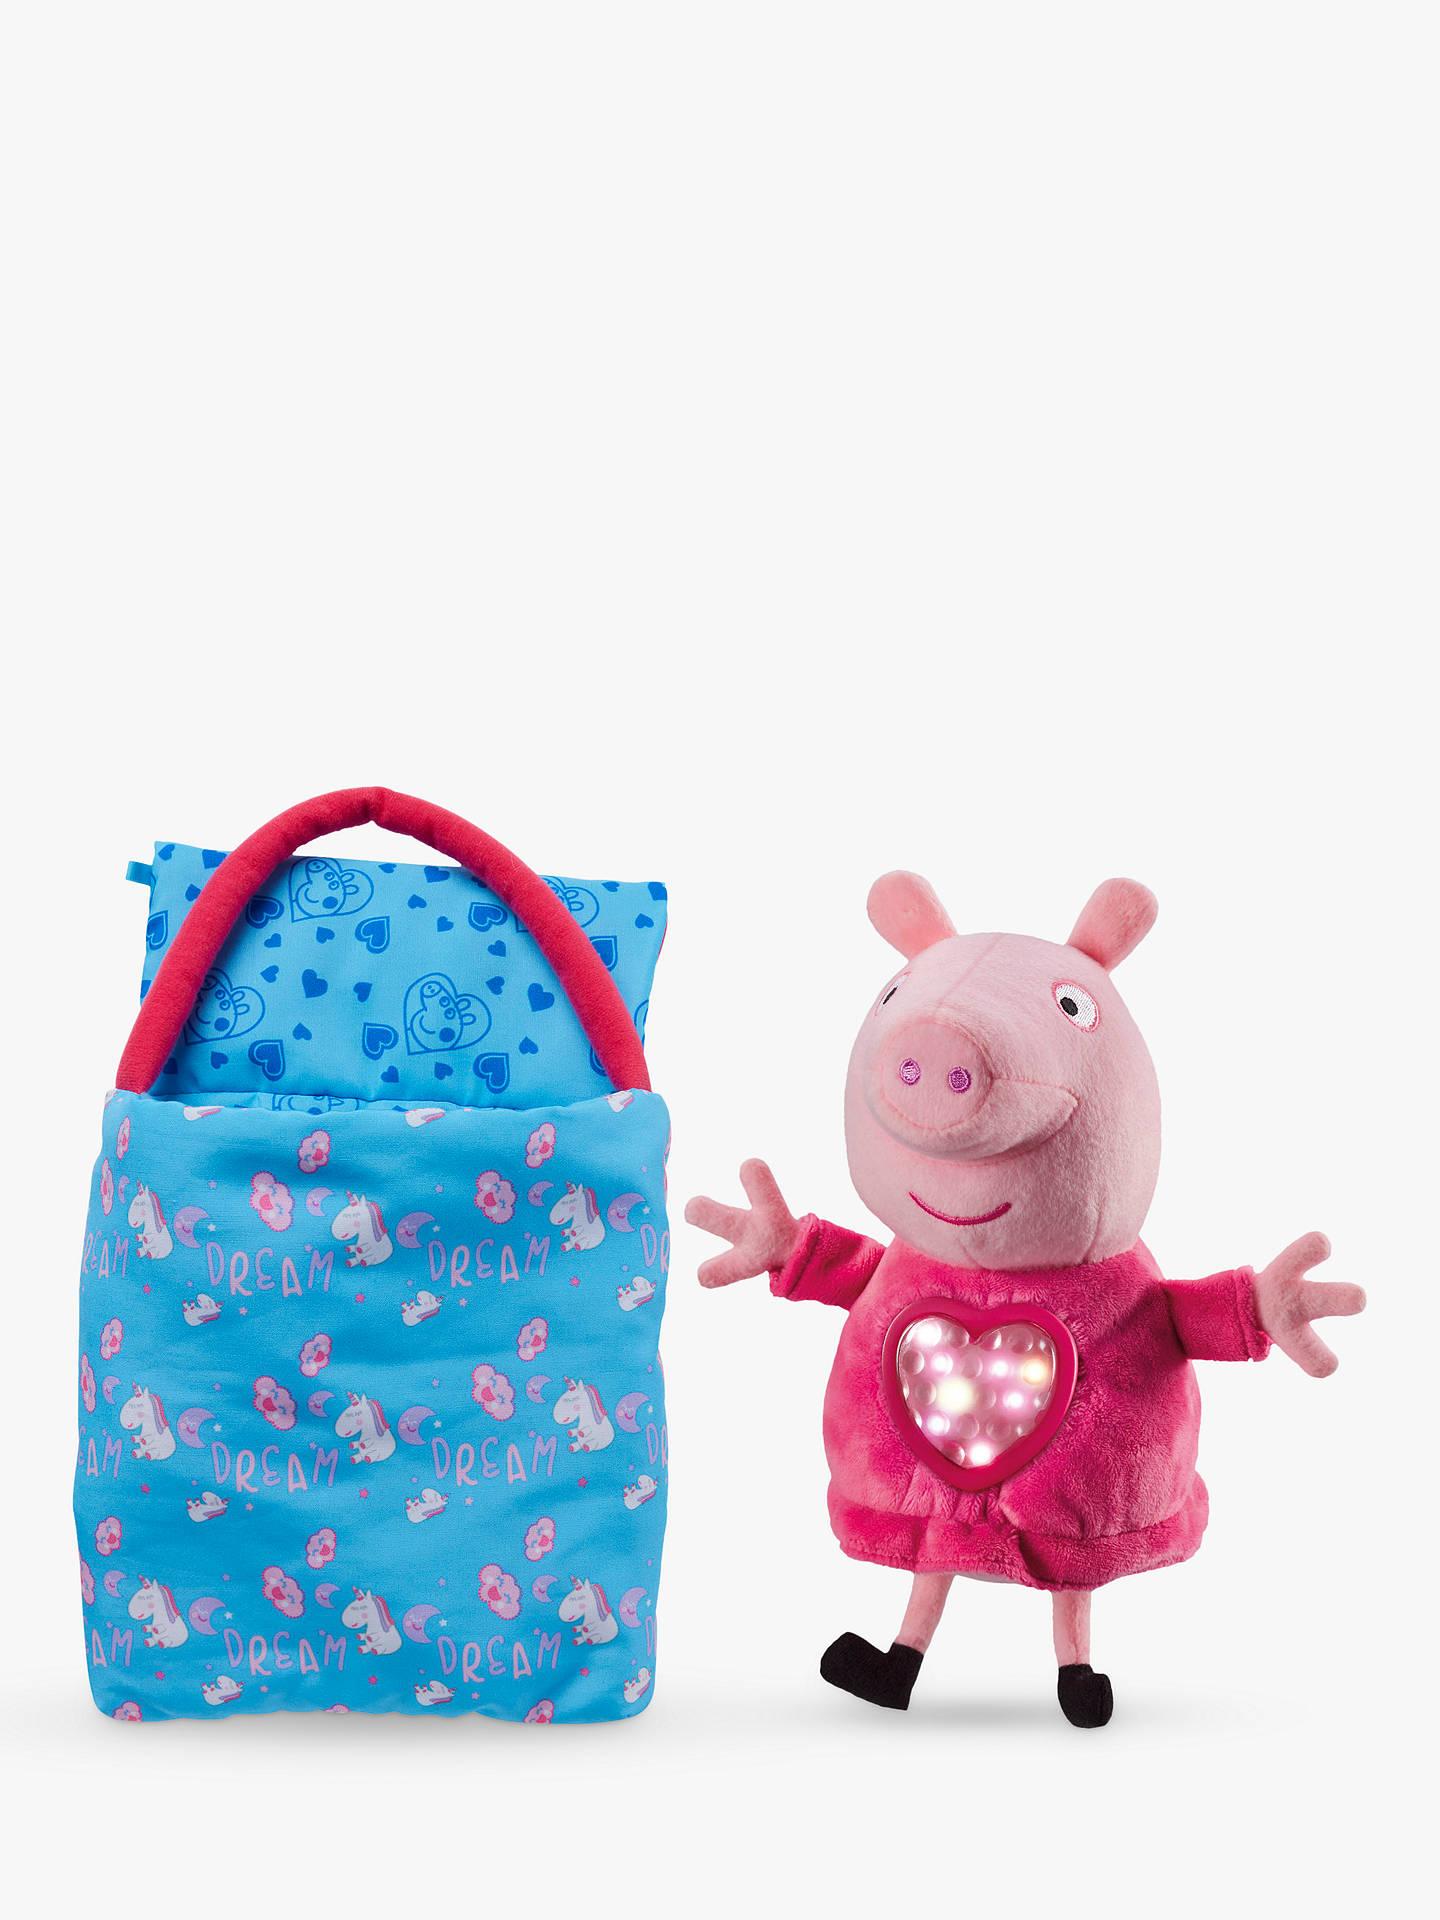 Peppa Pig ~ Sleepover Peppa Plush ~ Plays Lullaby Music